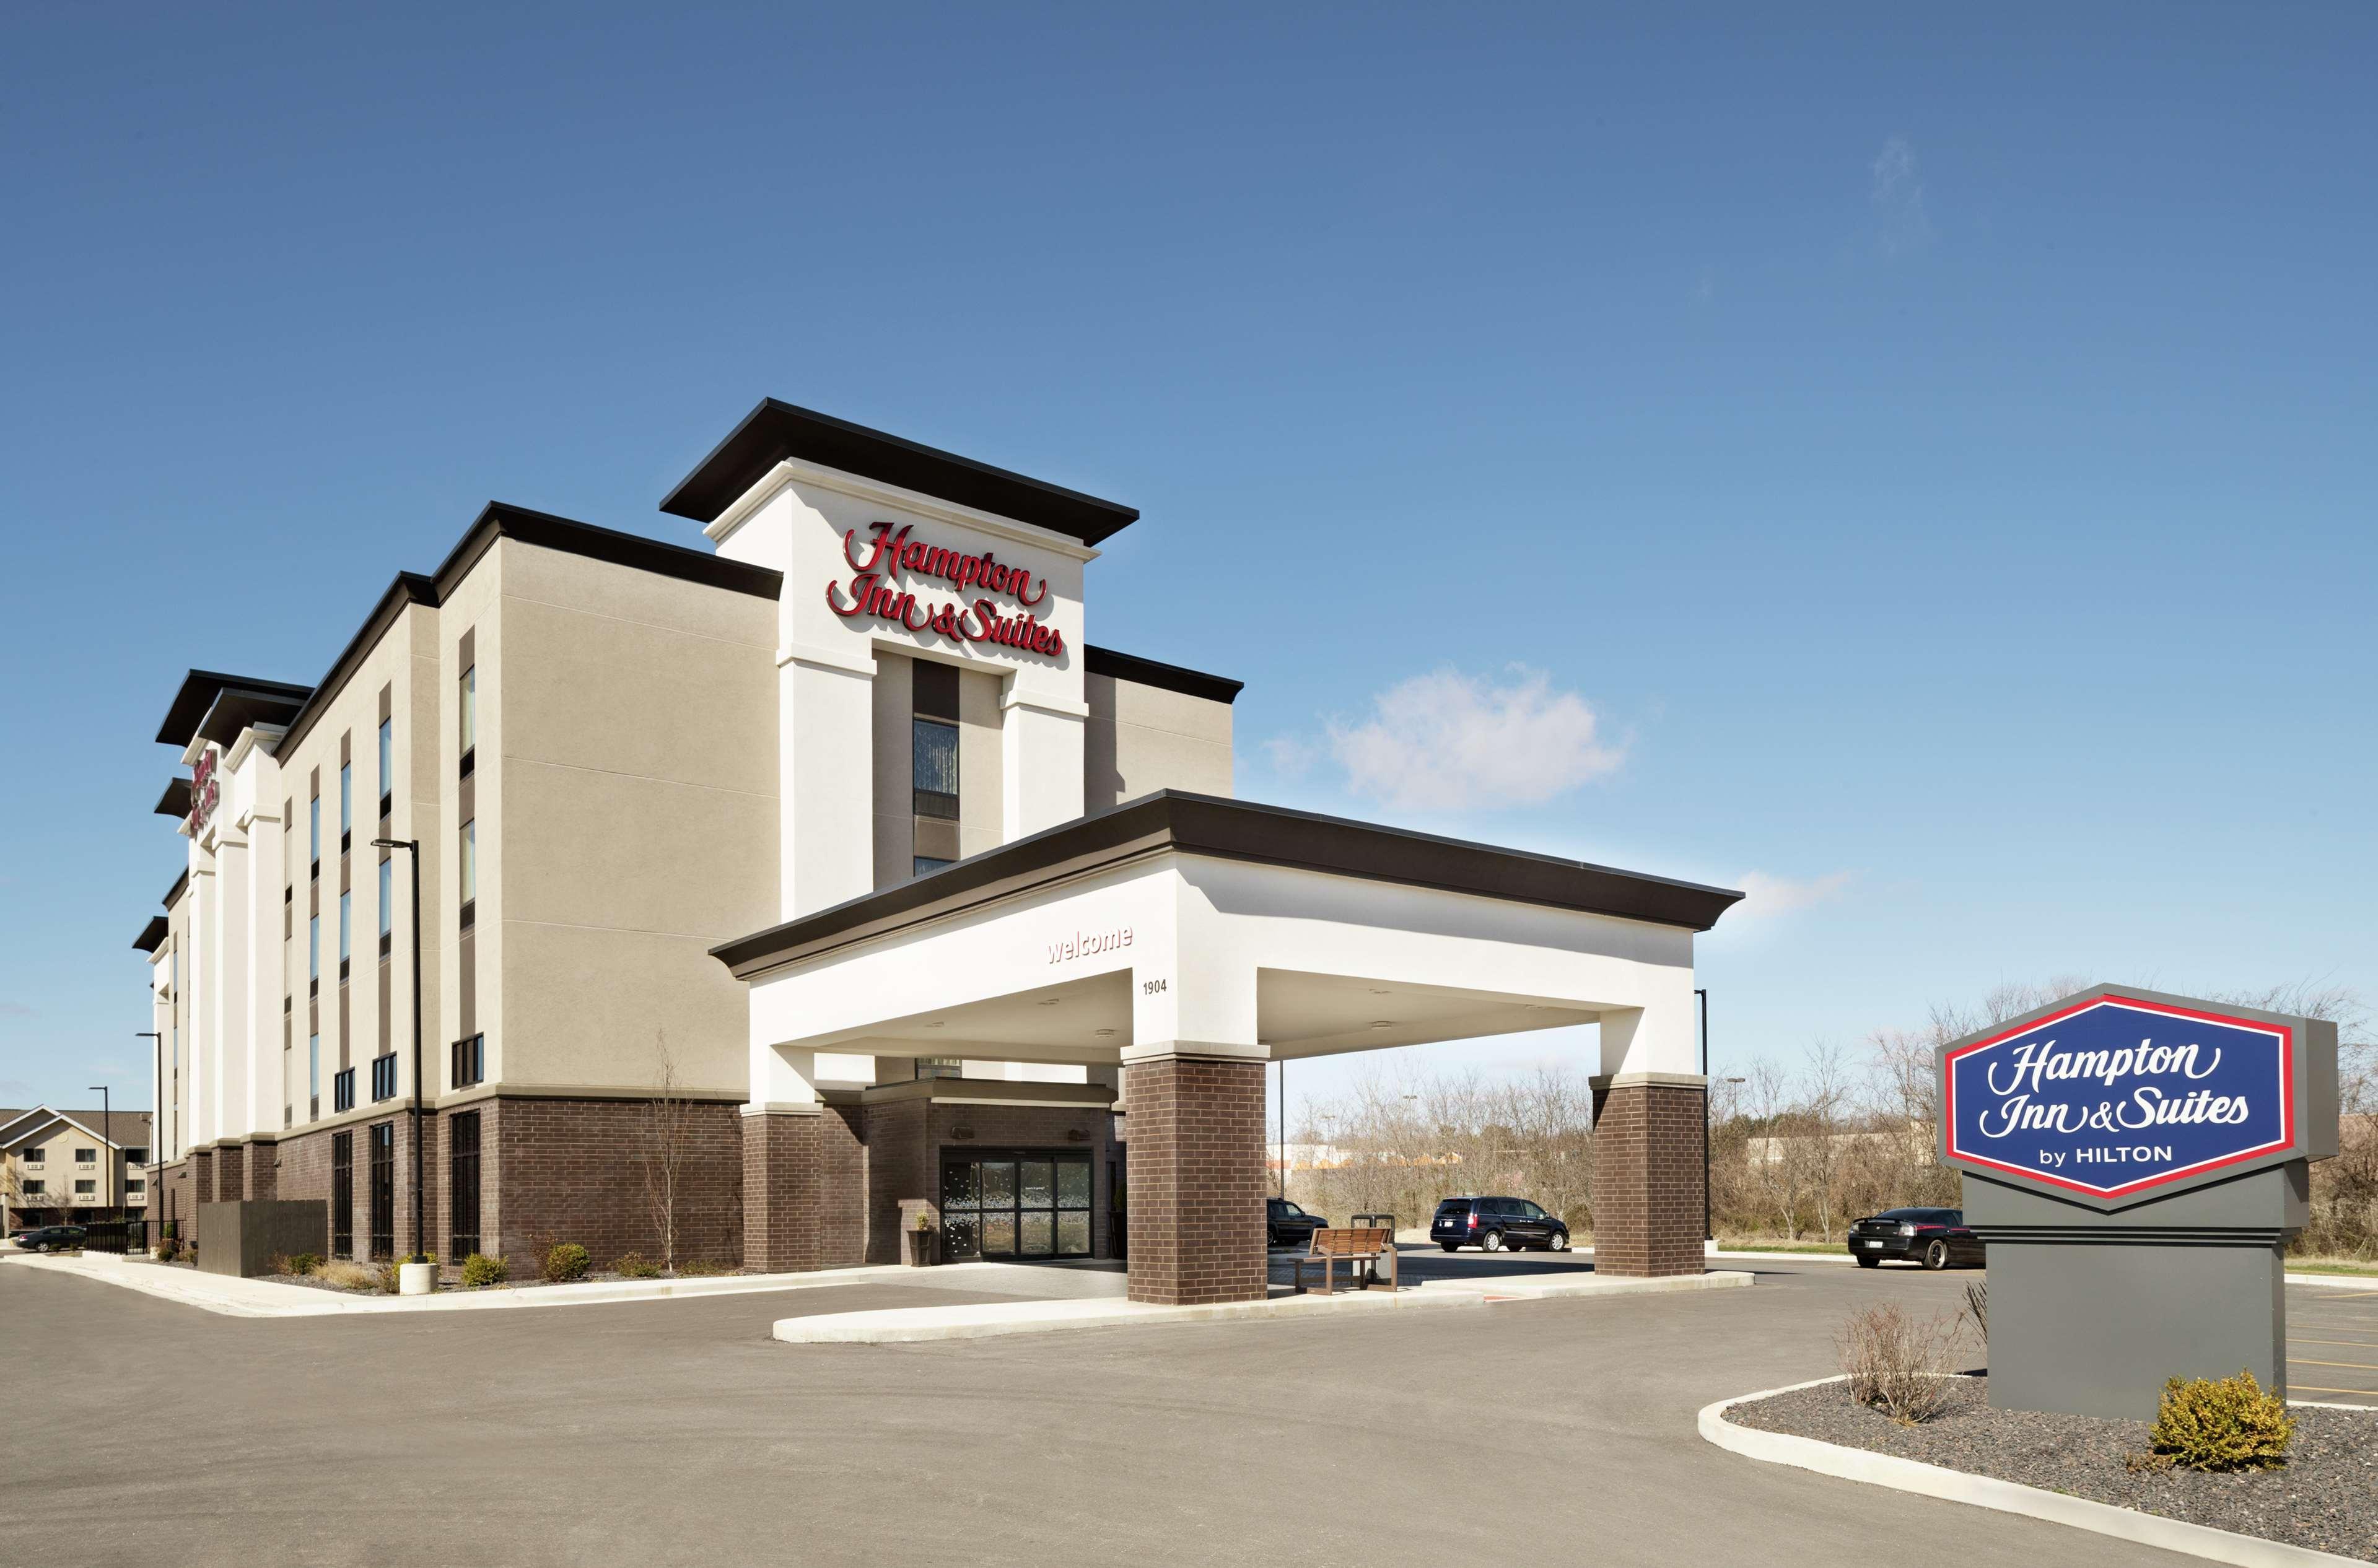 Hampton Inn and Suites St. Louis/Alton, IL, Madison